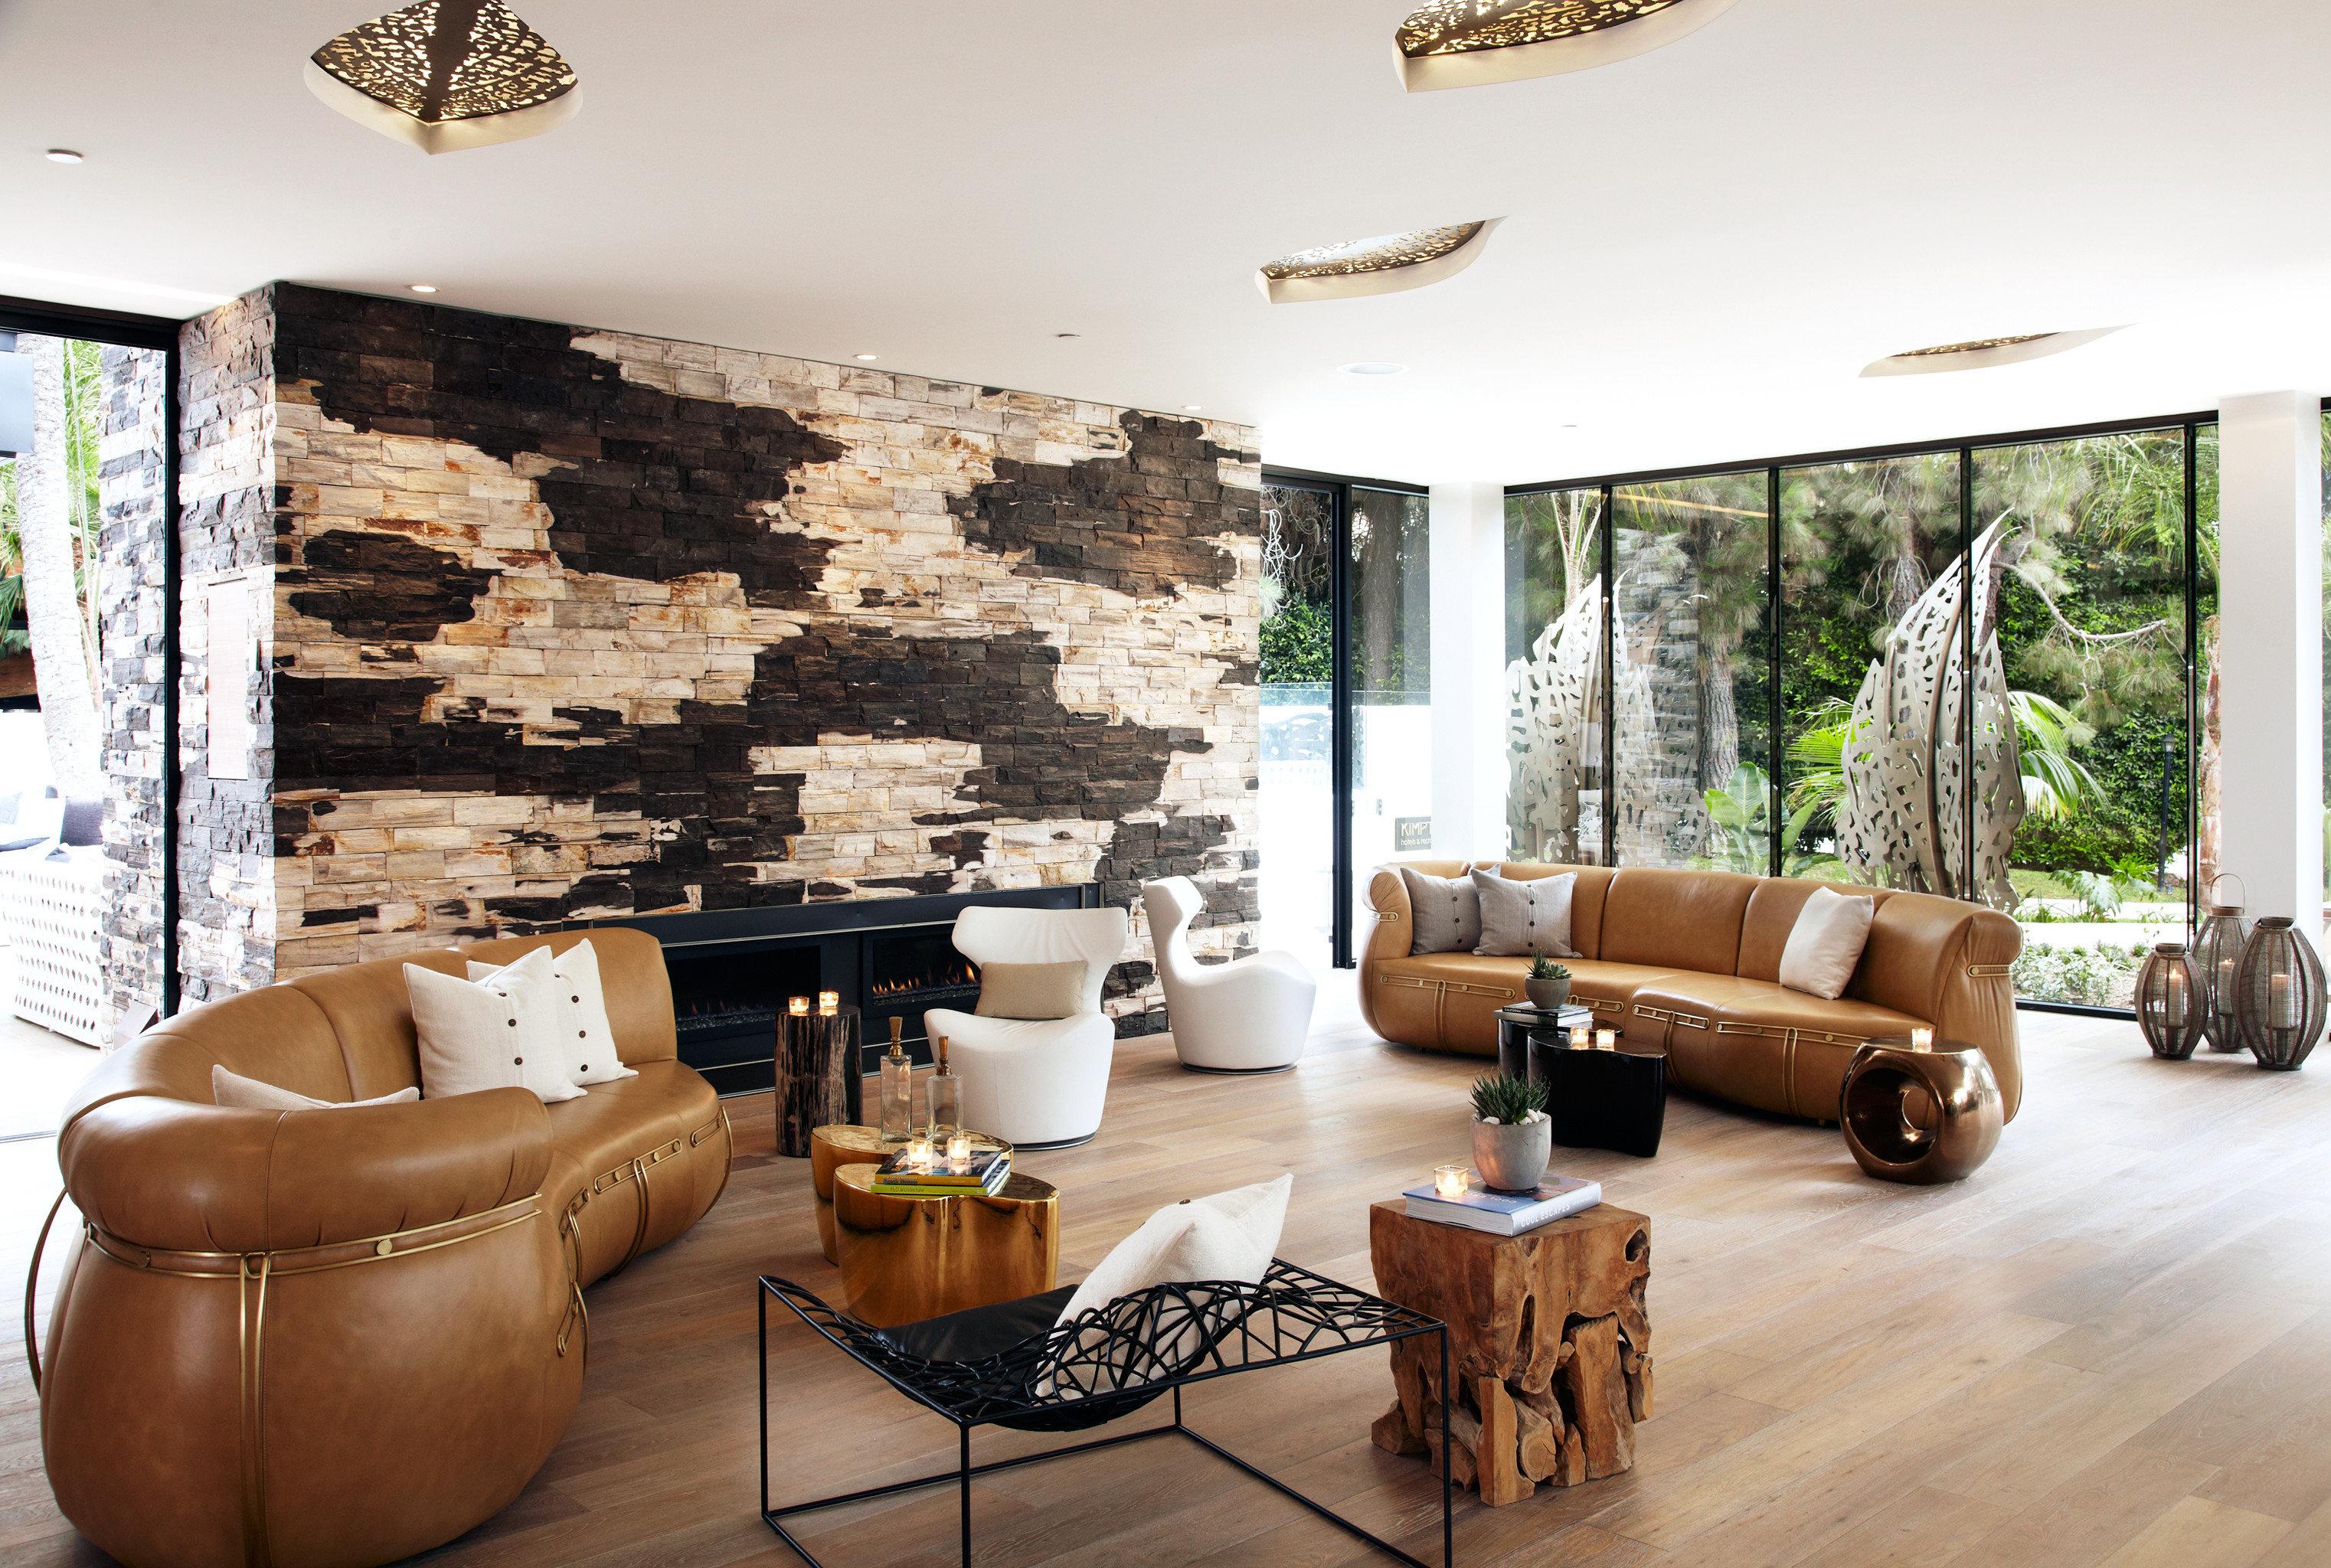 Fireplace Hip Hotels Lounge Trip Ideas living room property home hardwood flooring wood flooring laminate flooring cottage leather